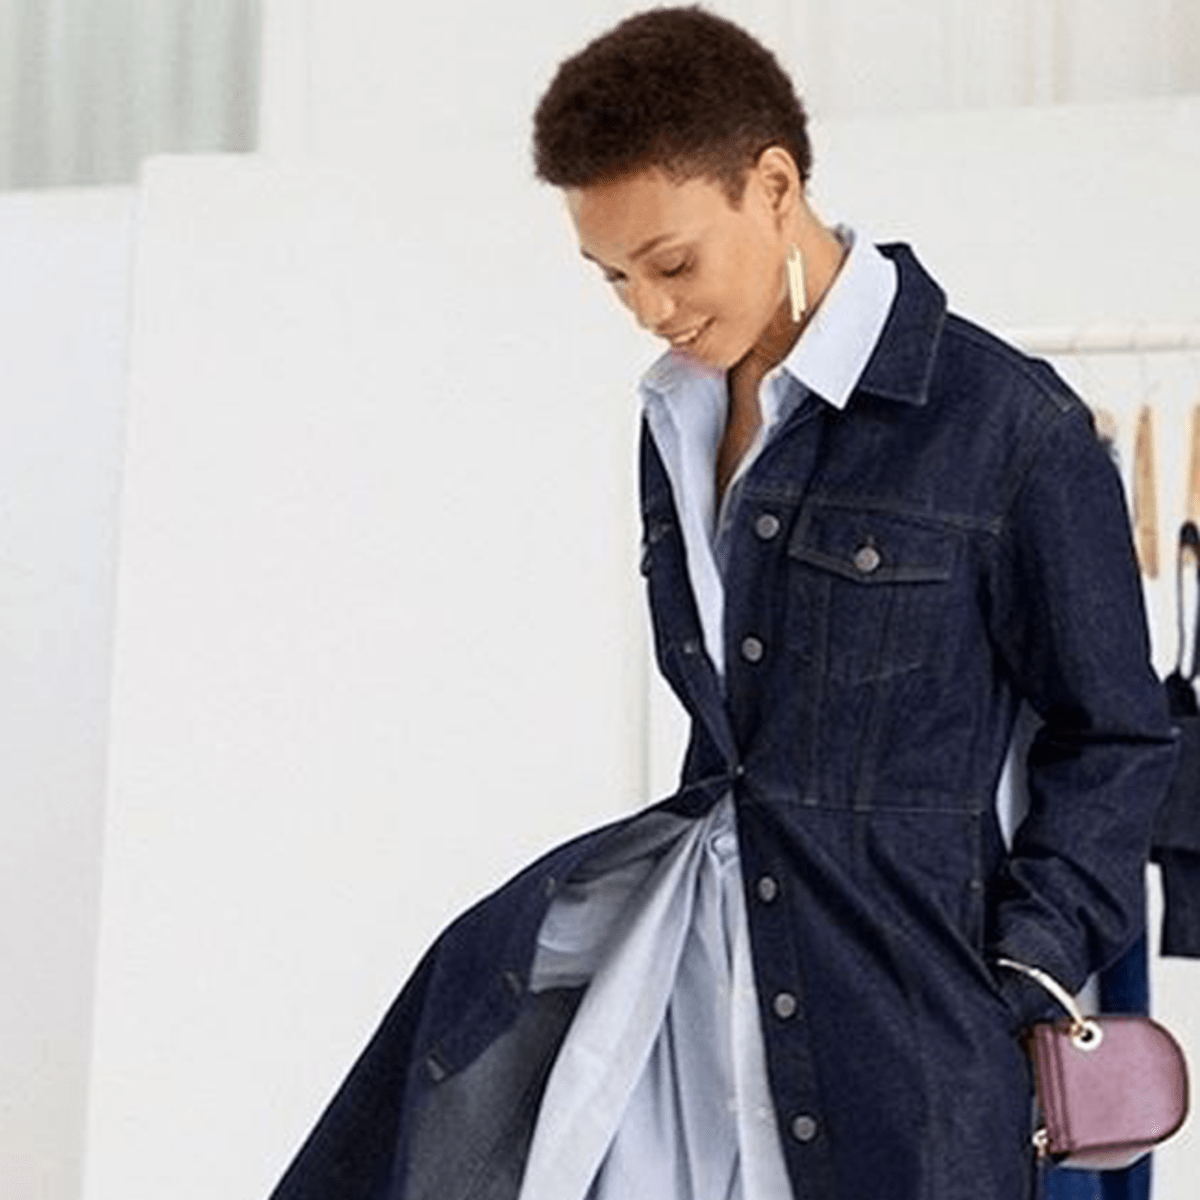 World's Best Women's Clothing Stores: The Fashionista Ranking - Fashionista